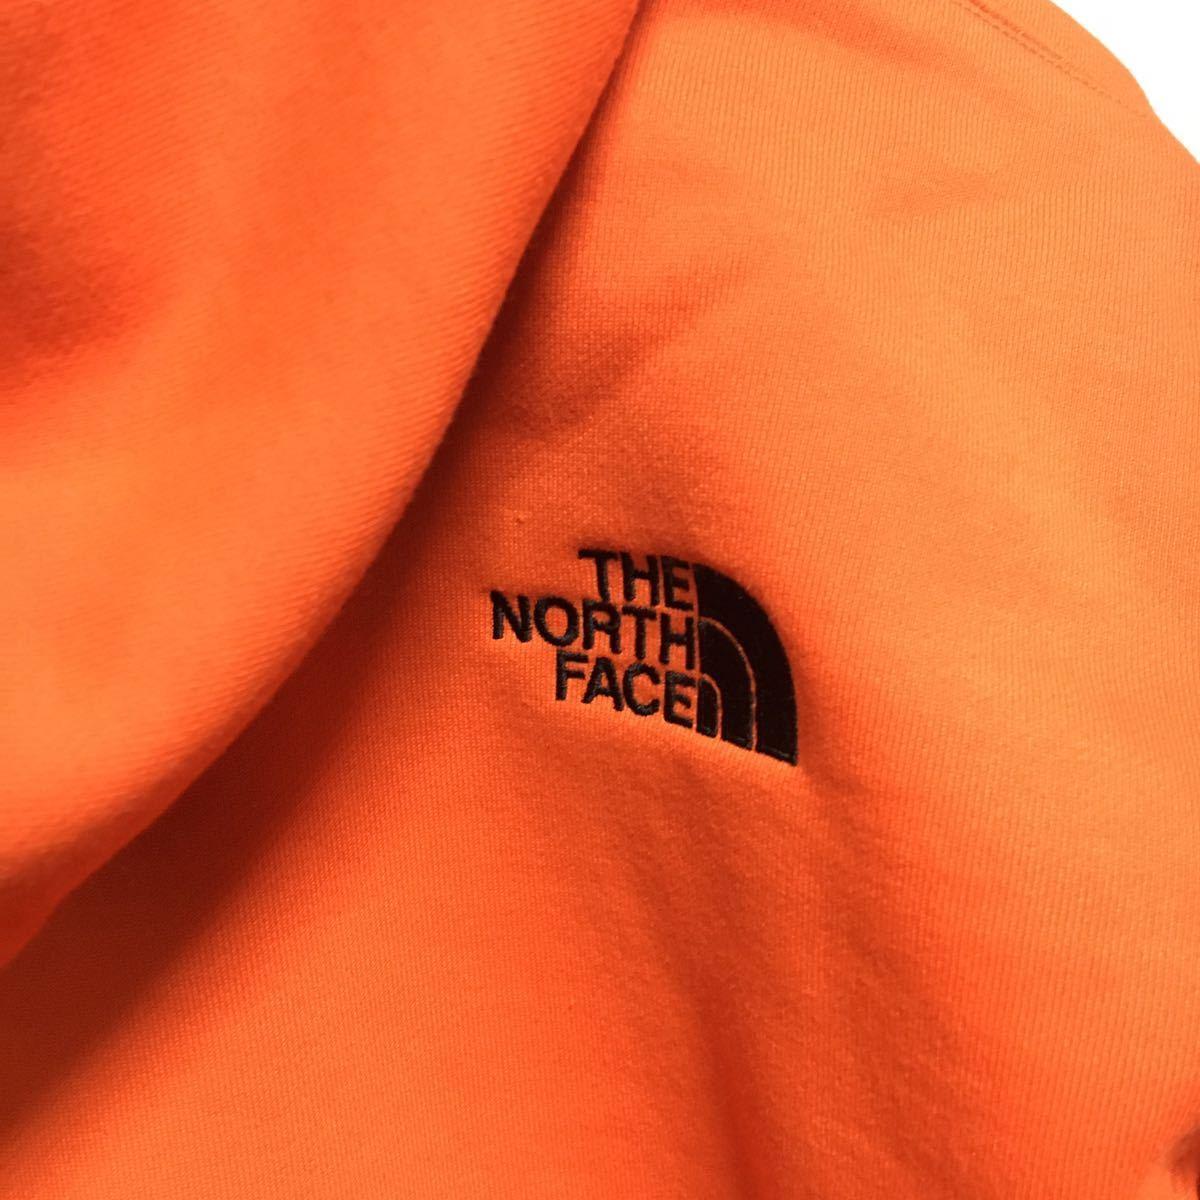 20AW 新品 直営店限定【Lサイズ】ノースフェイス【NT61916R】BIG HOODIE ビッグフーディ ビッグフーディー パーカー PG パパイヤオレンジ_画像6